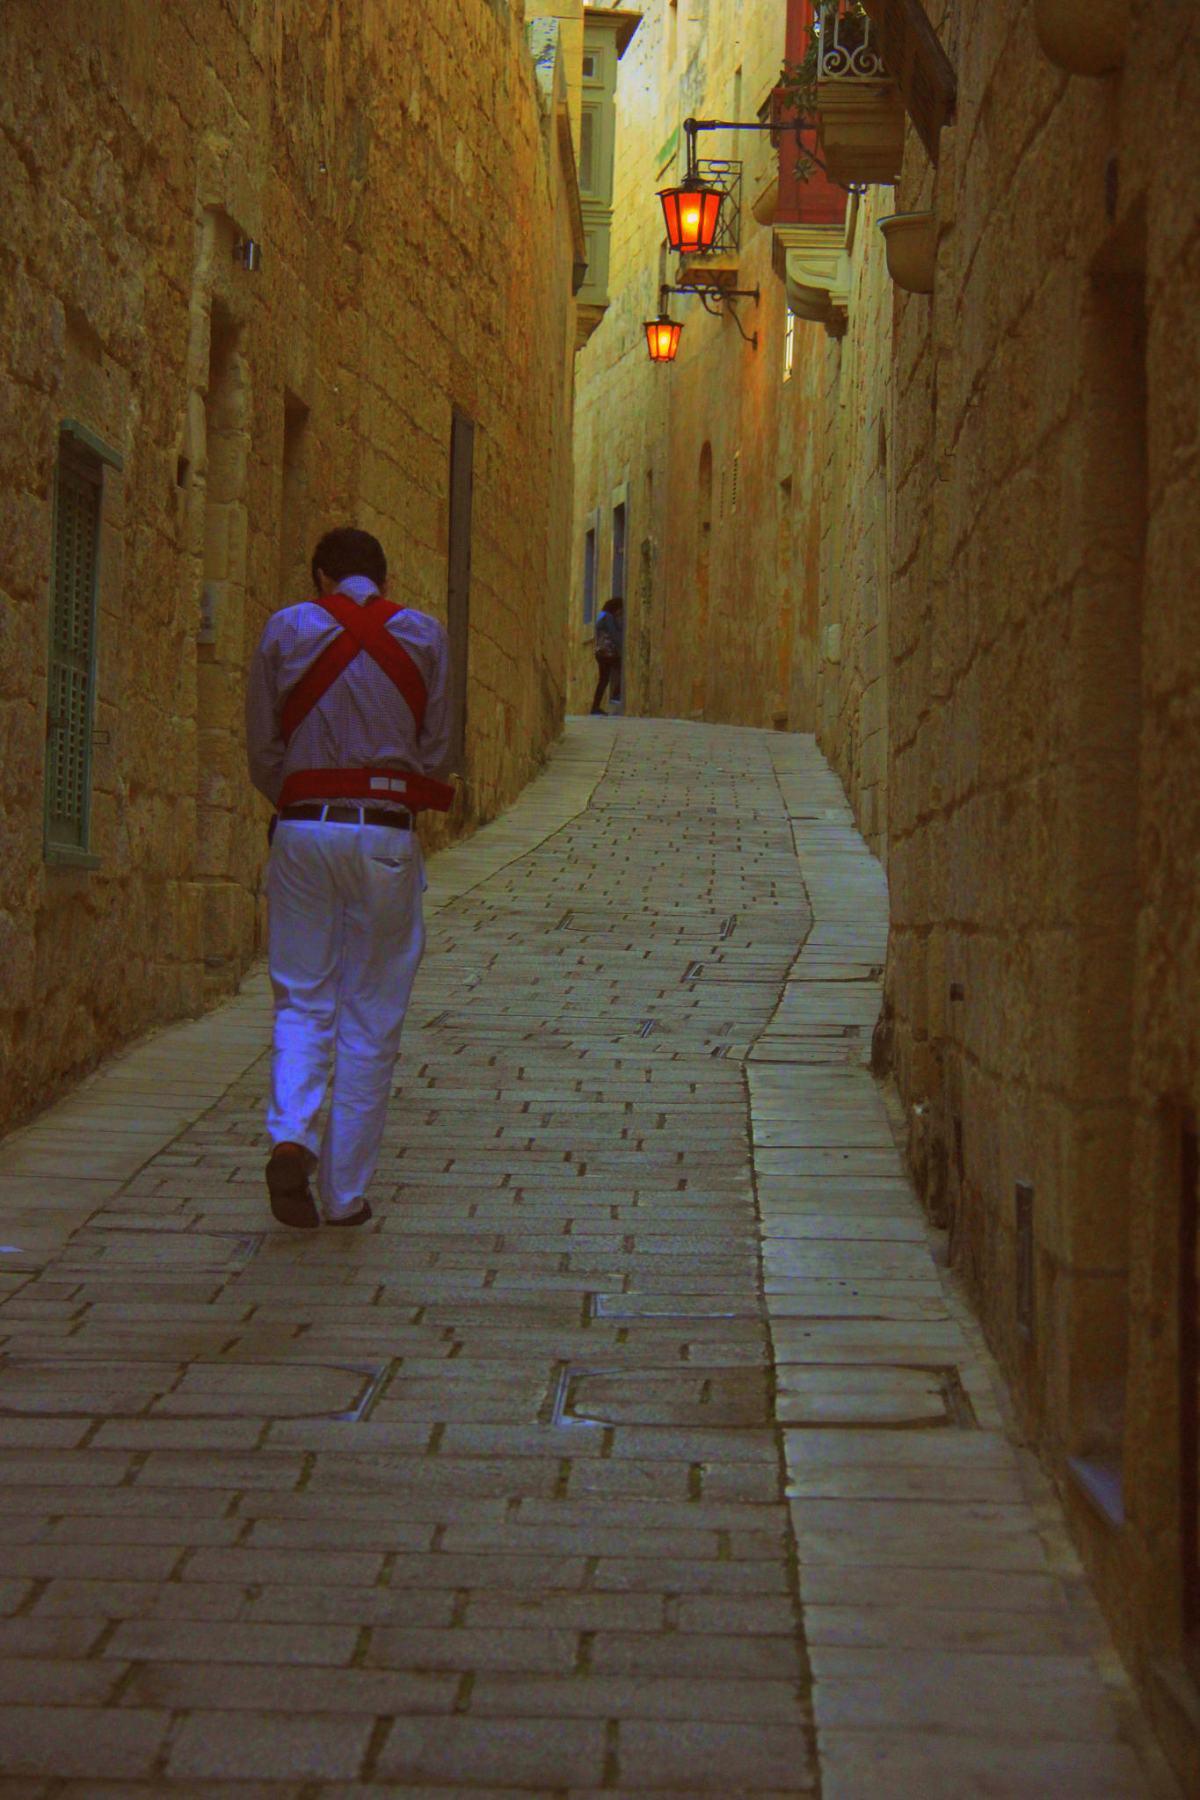 Mdina in Malta has no vehicular traffic of the visitors